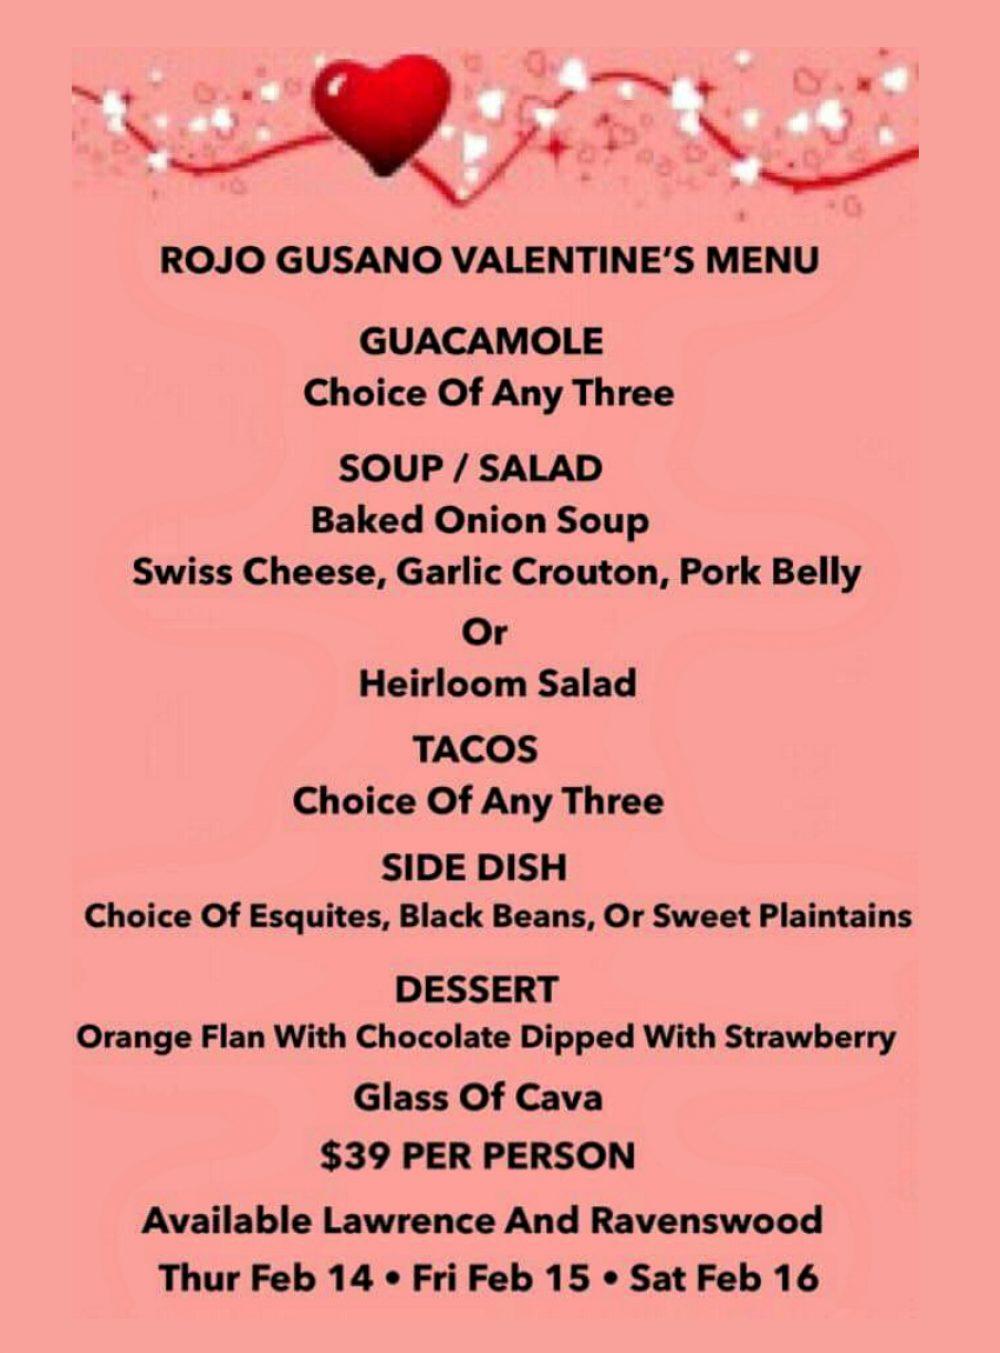 Rojo Gusano Valentine's Menu